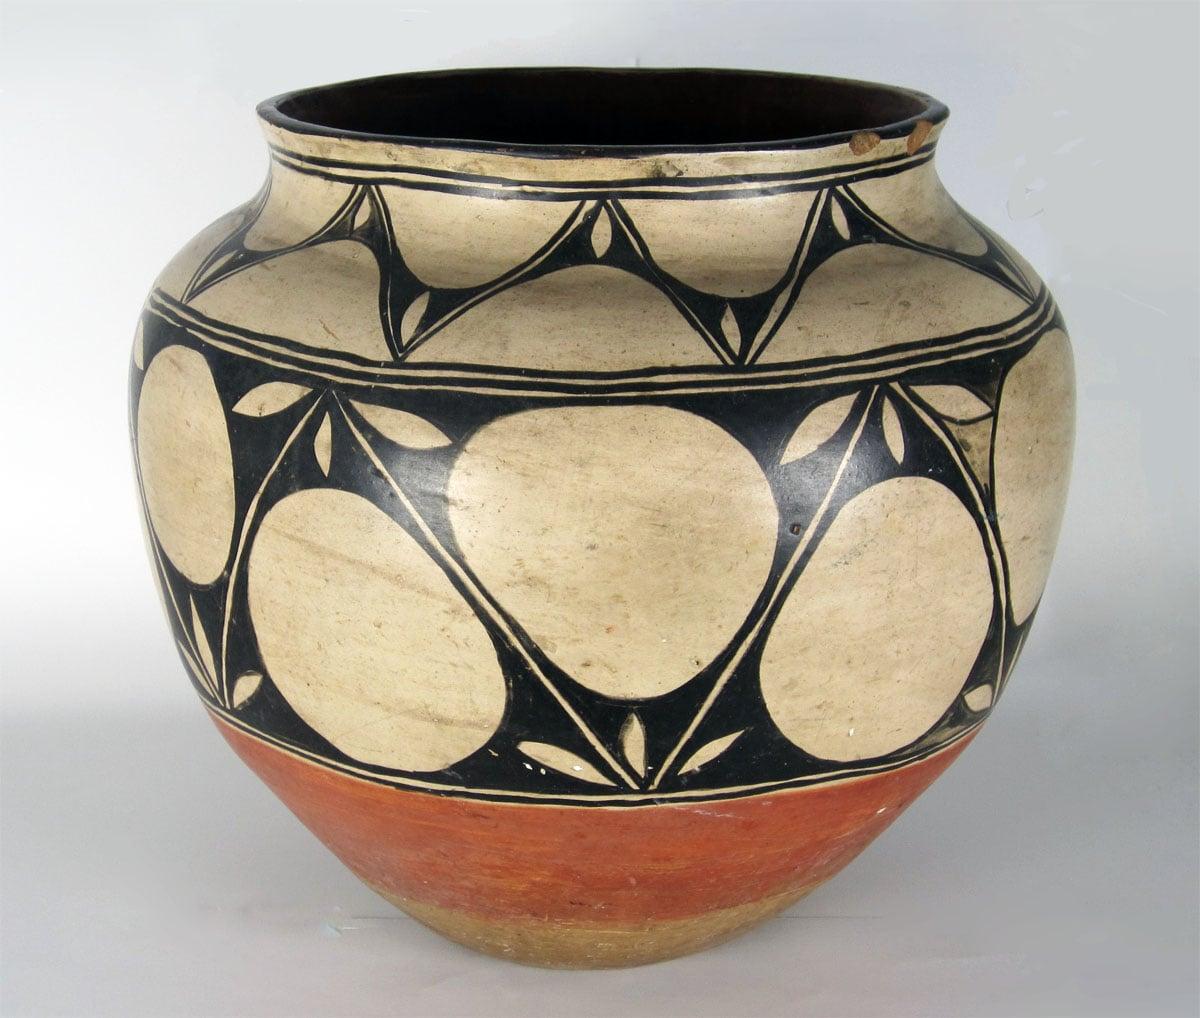 "Historic Santo Domingo large storage jar, 17 3/4"" diameter x 19"" high: http://www.marcyburns.com/pottery-collection/santo-domingo-large-storage-jar"